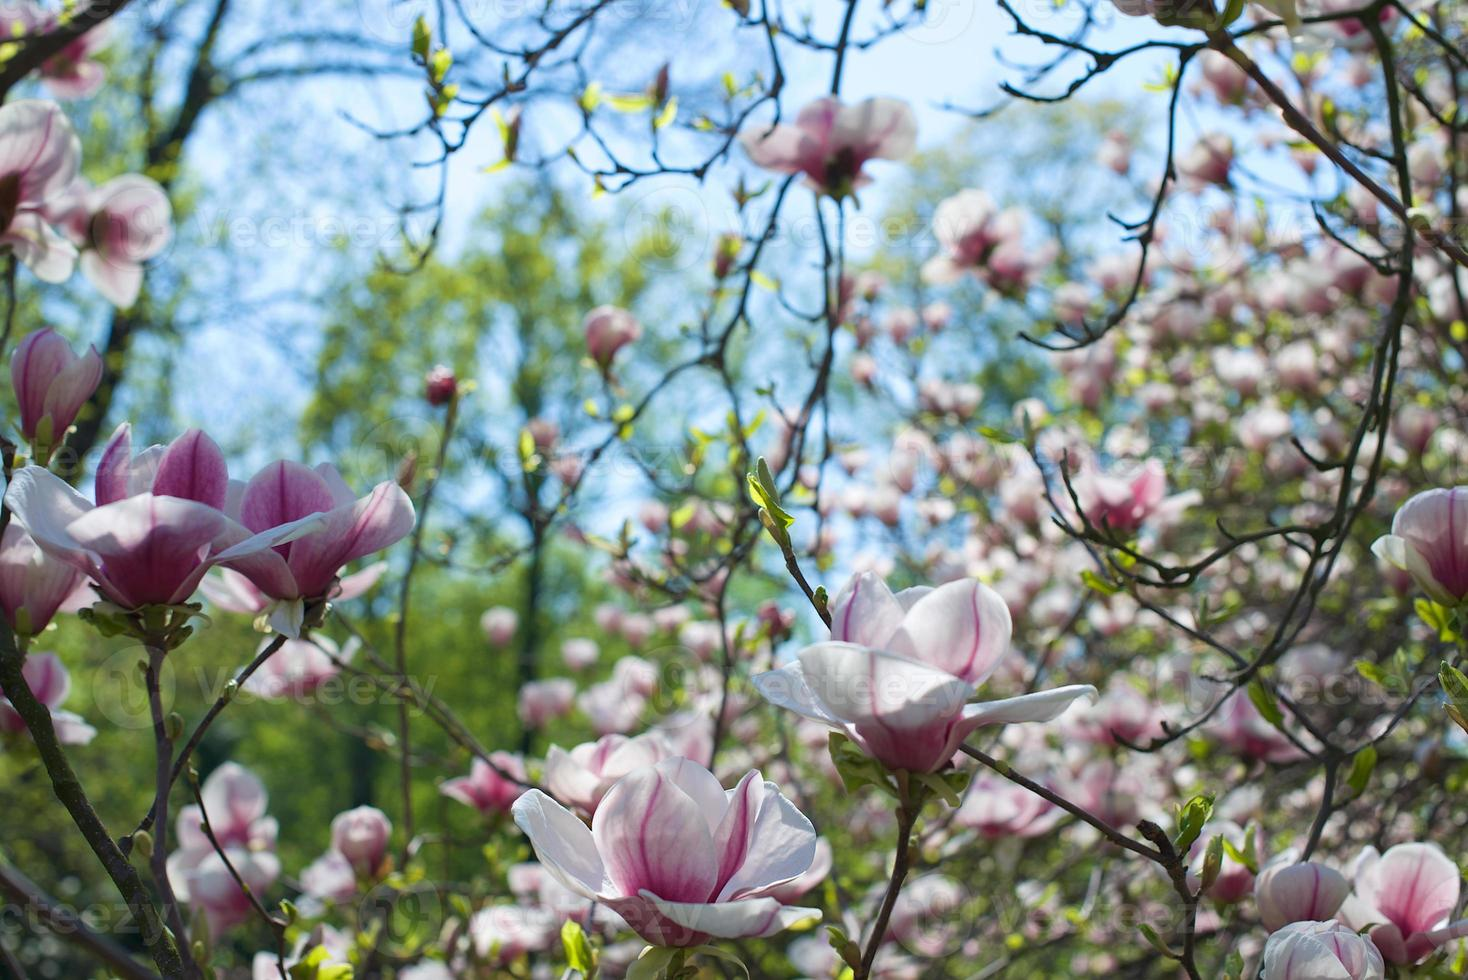 Magnolia Flower tree in Blossom photo